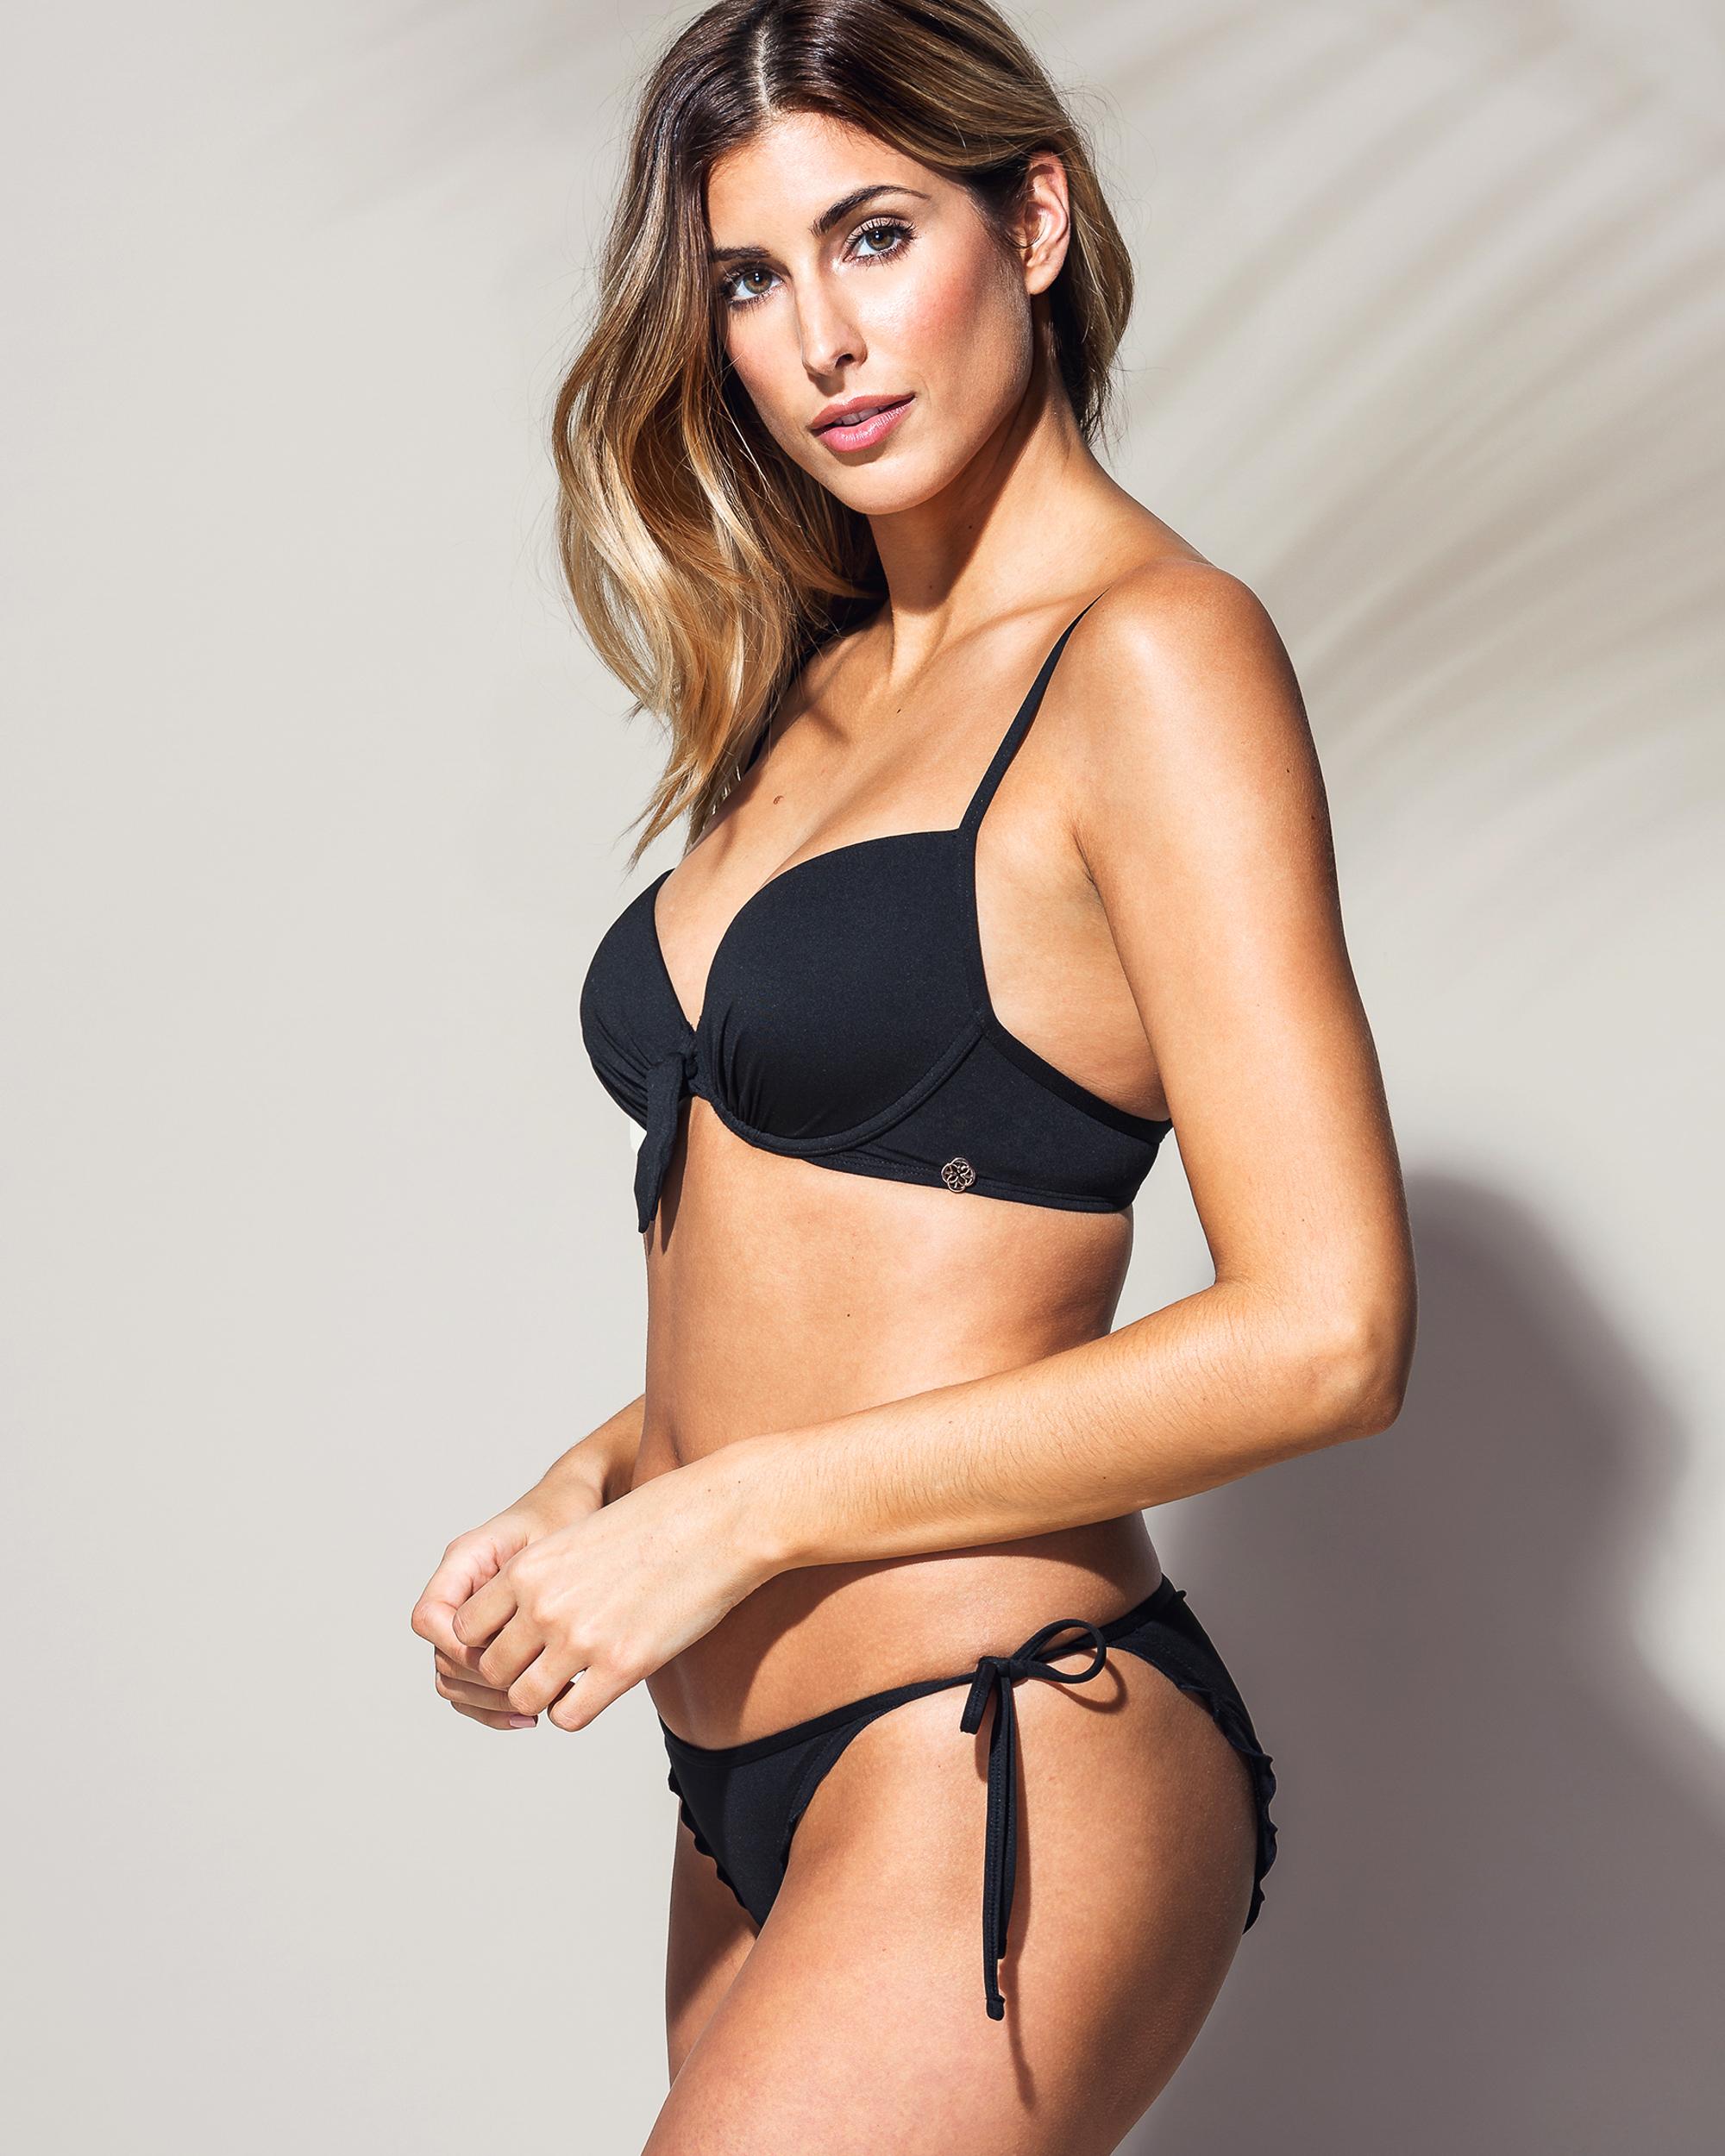 Bikini-Village_Jany-Tremblay-18.jpg